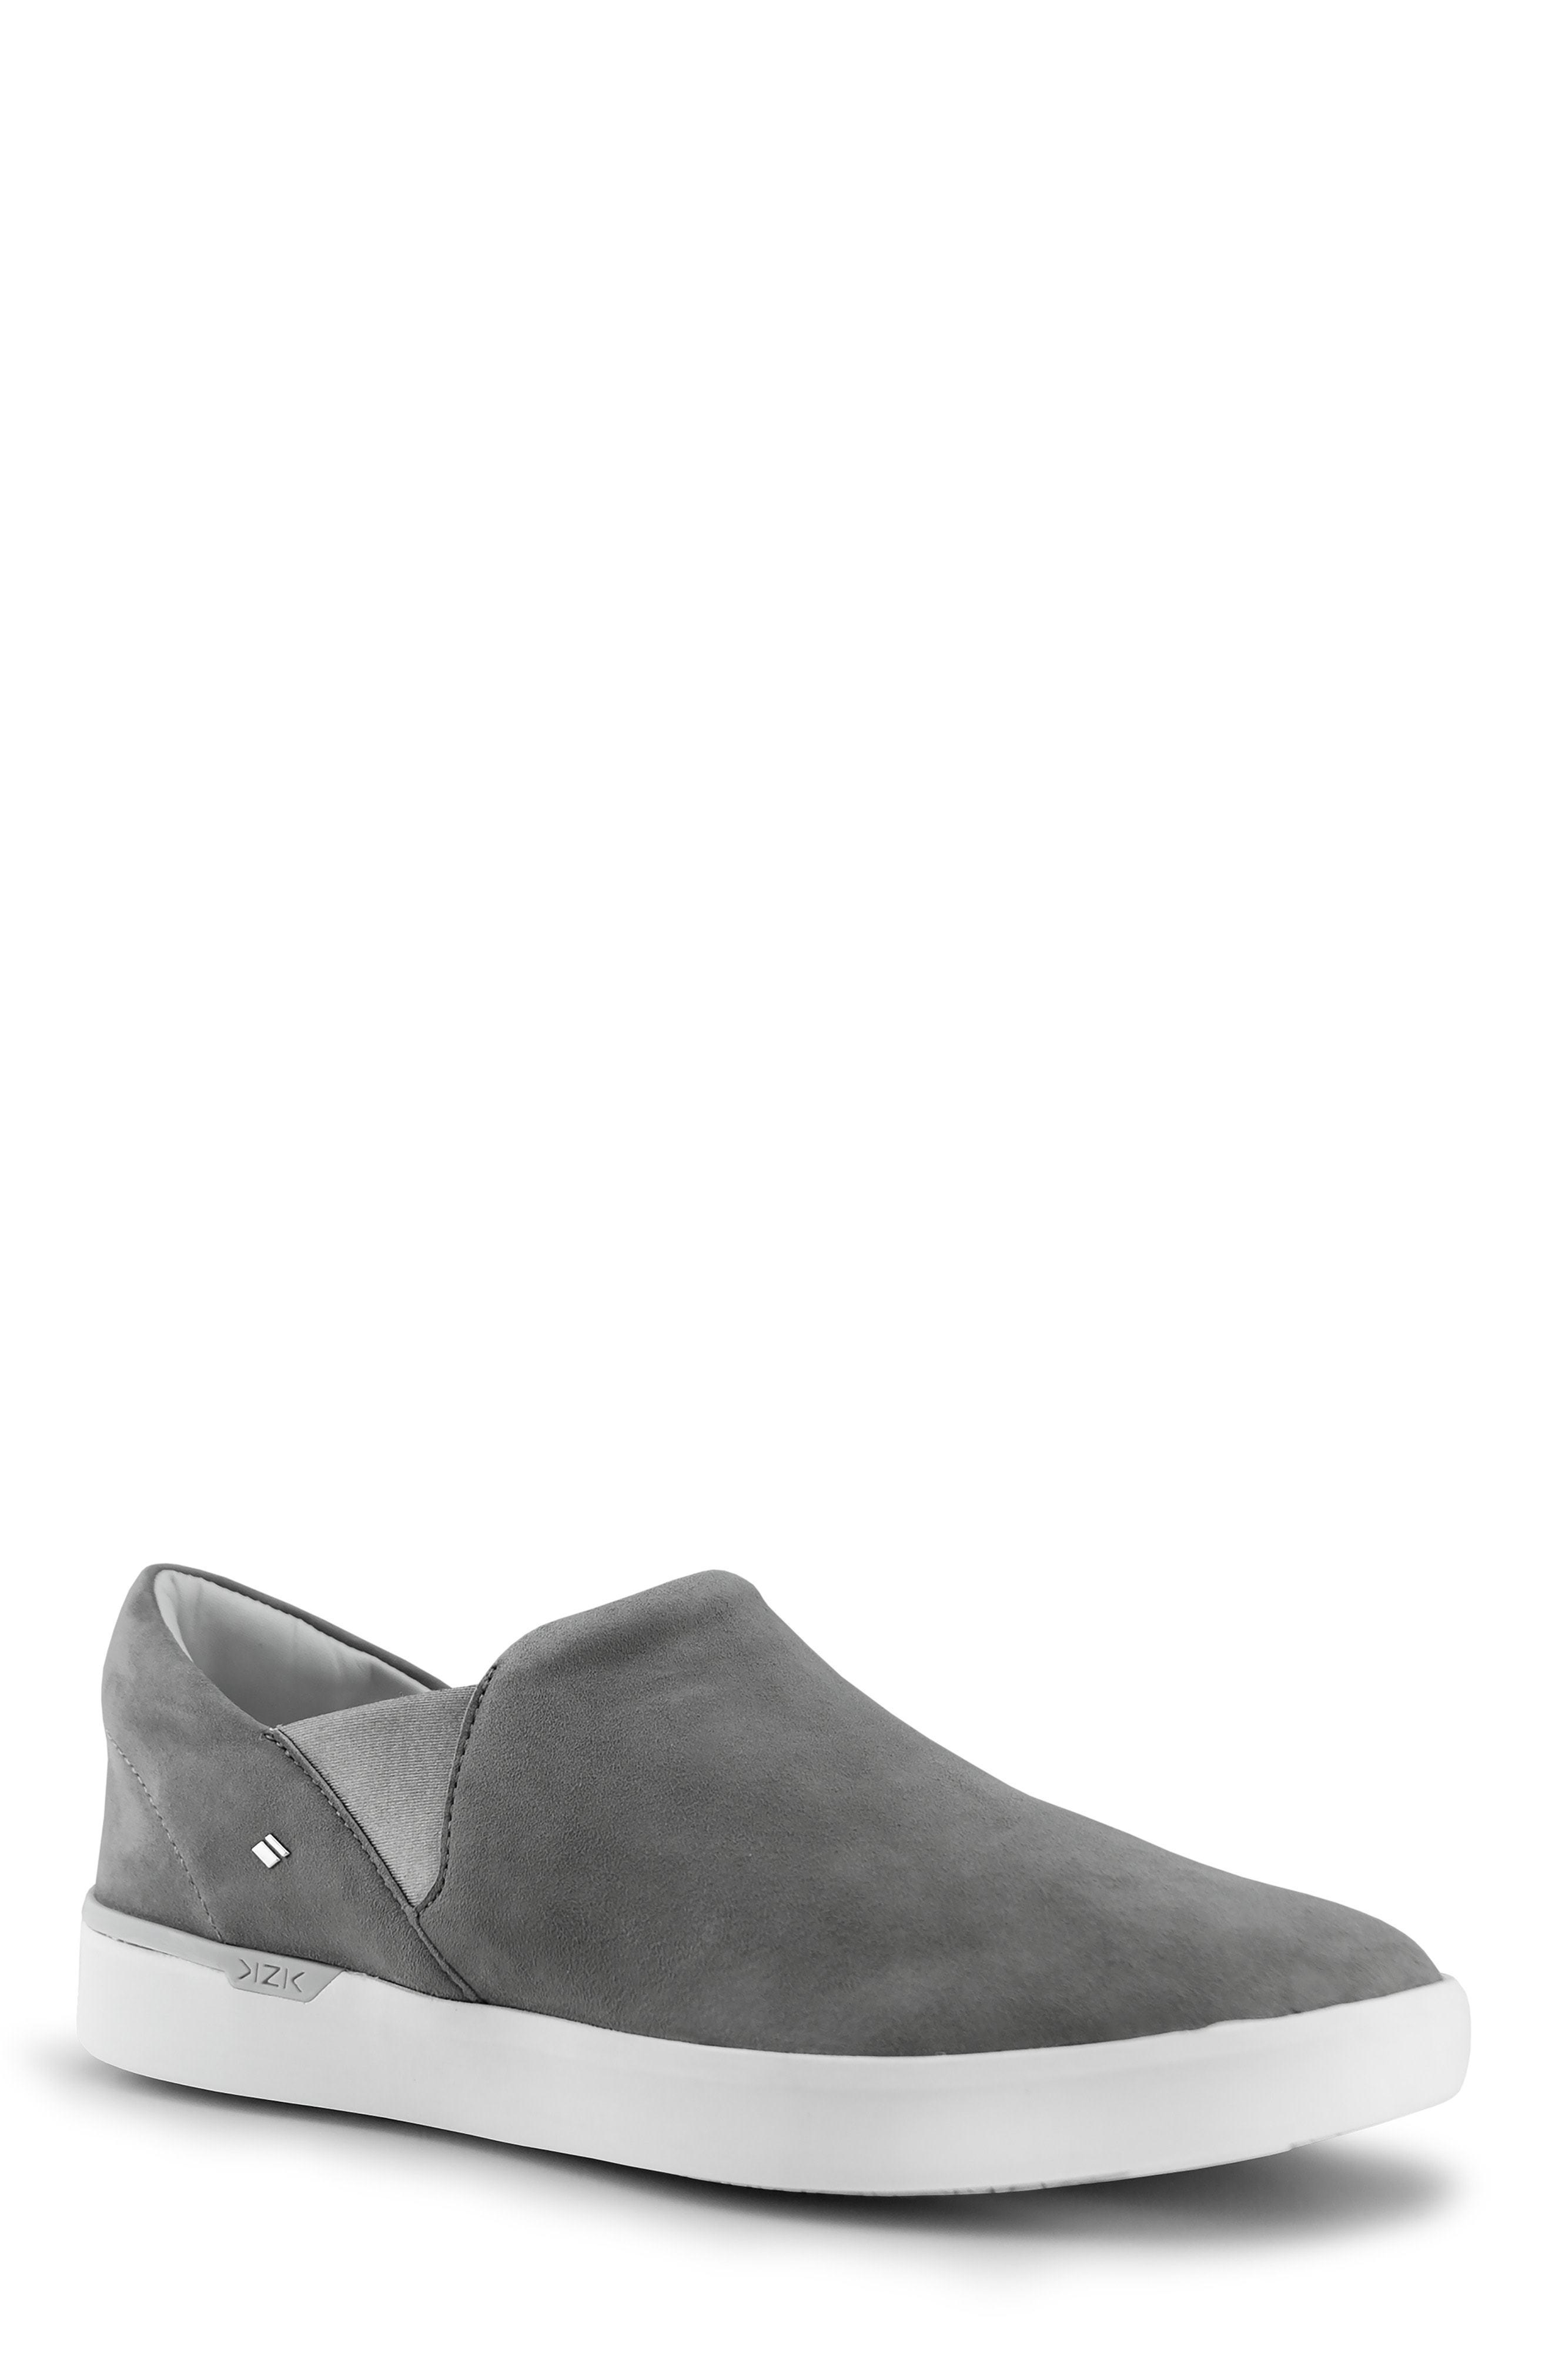 6df51e2f93 ... KIZIK Paris Slip On Sneaker